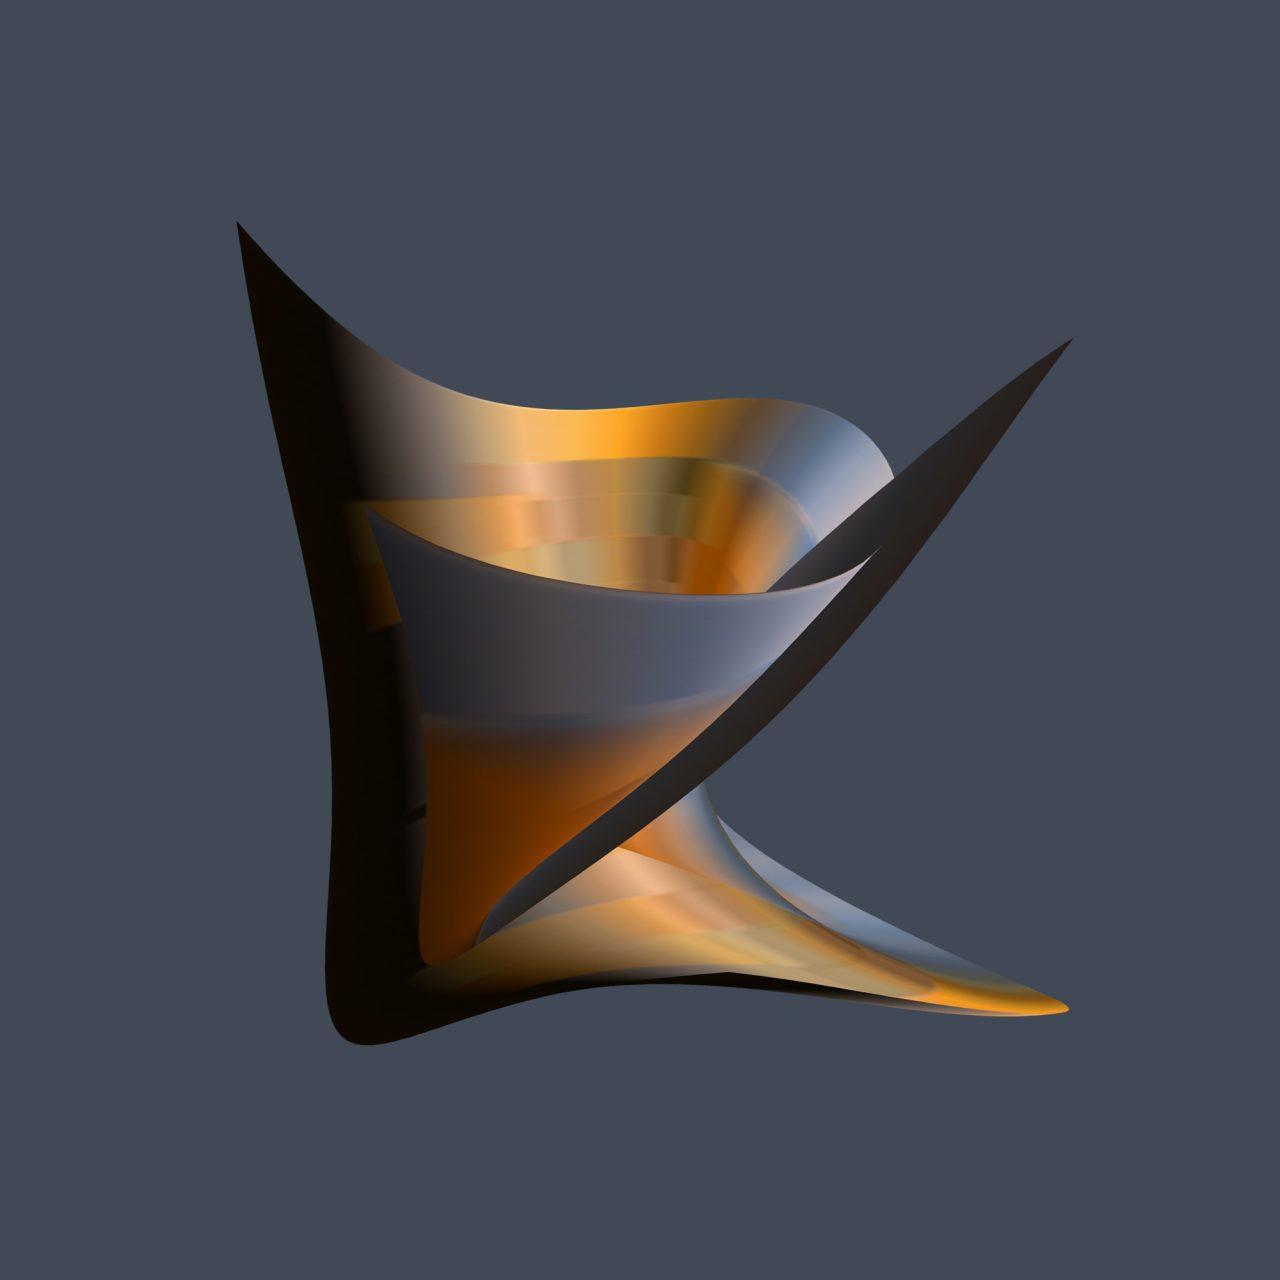 Fine Boots, aus der Reihe Fashion, Experimental Fine Art Photography, 2018, 80 cm x 80 cm / 50 cmx 50 cm